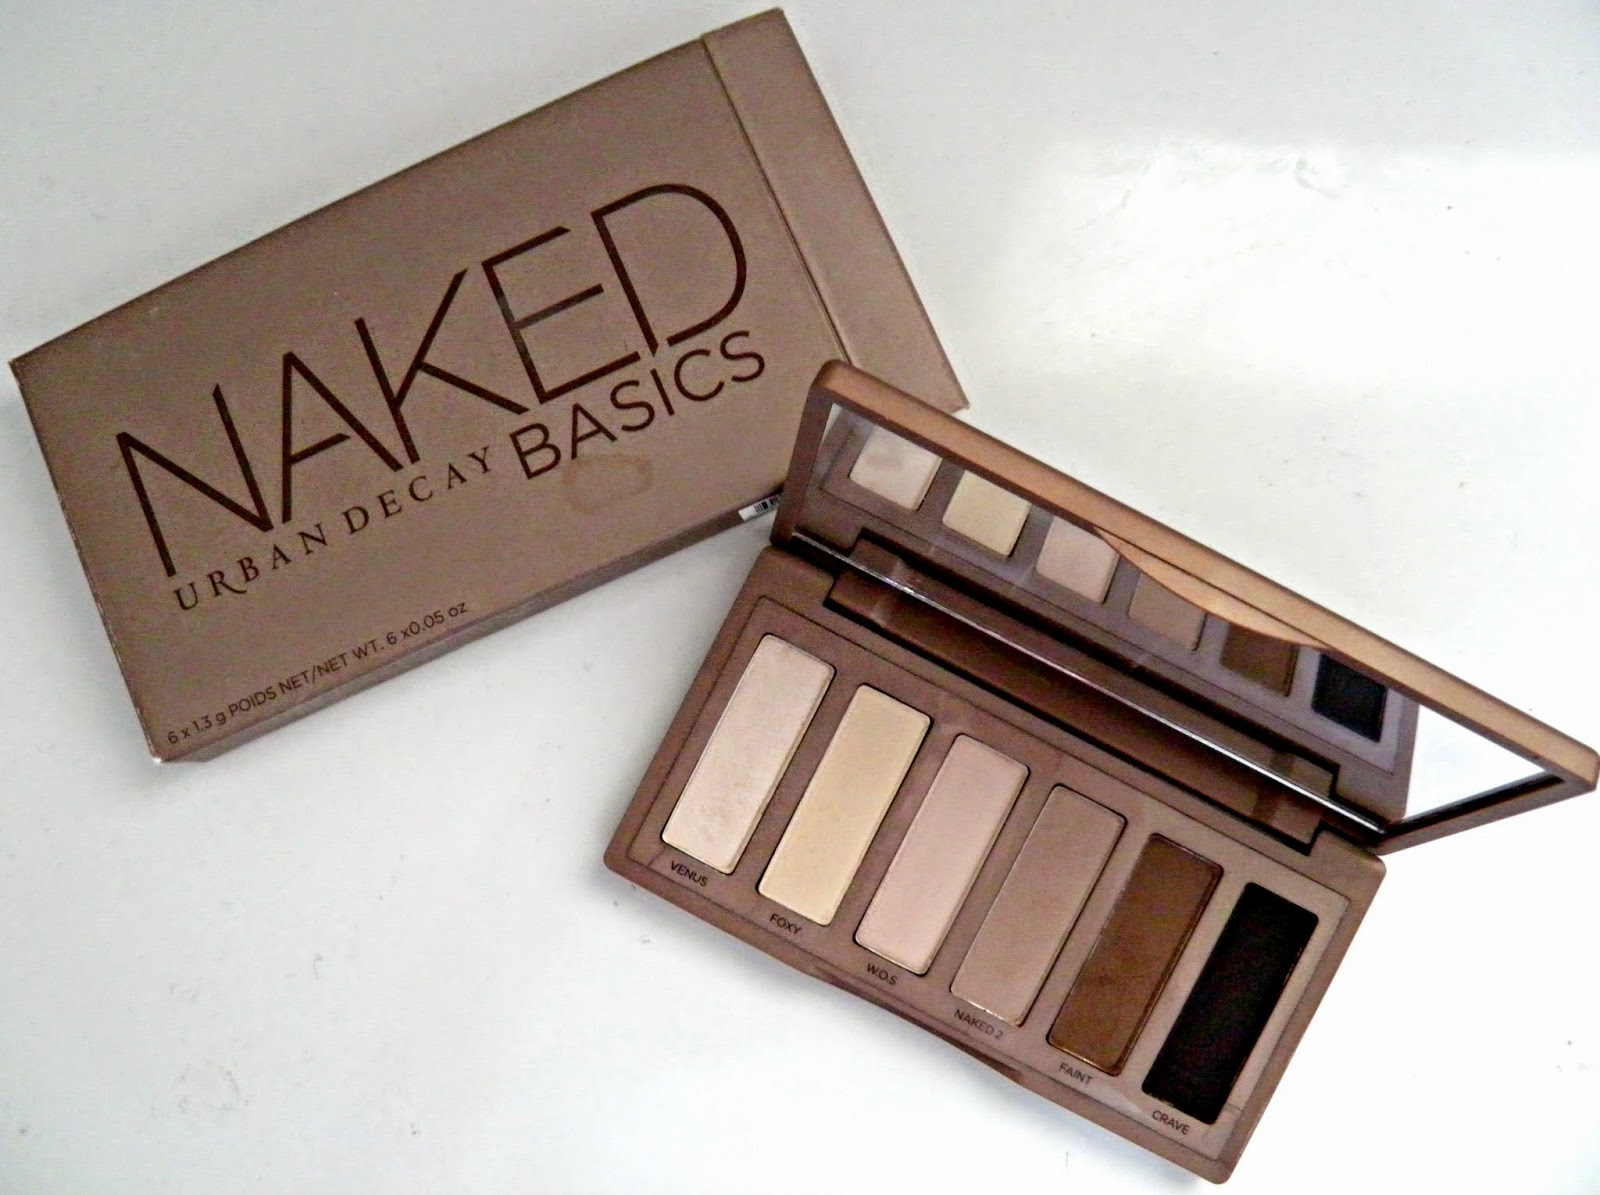 Urban Decay Naked Basics » Beauty Skeptic